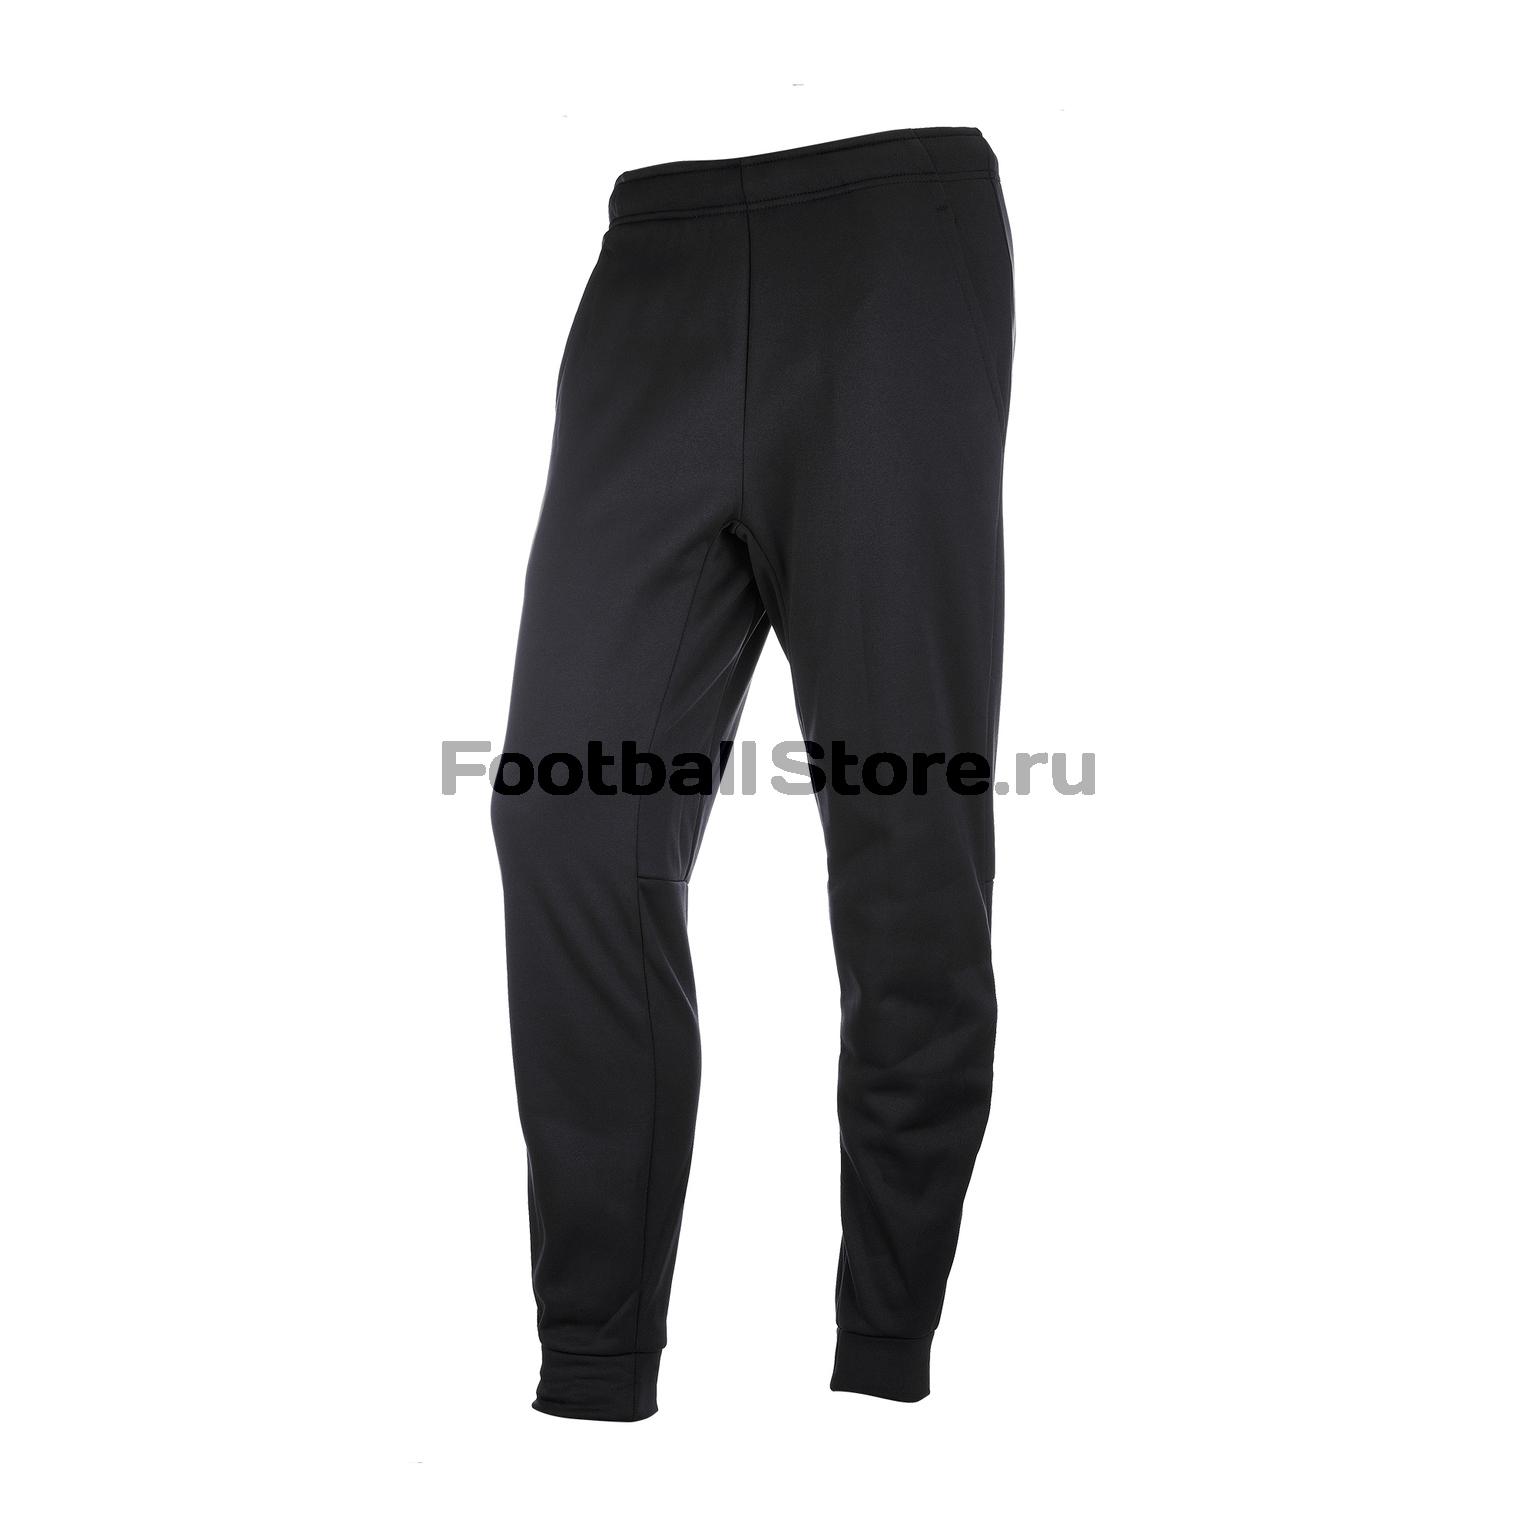 Брюки тренировочные Nike THRMA Pant Taper 932255-010 брюки nike pant bb bq6467 451